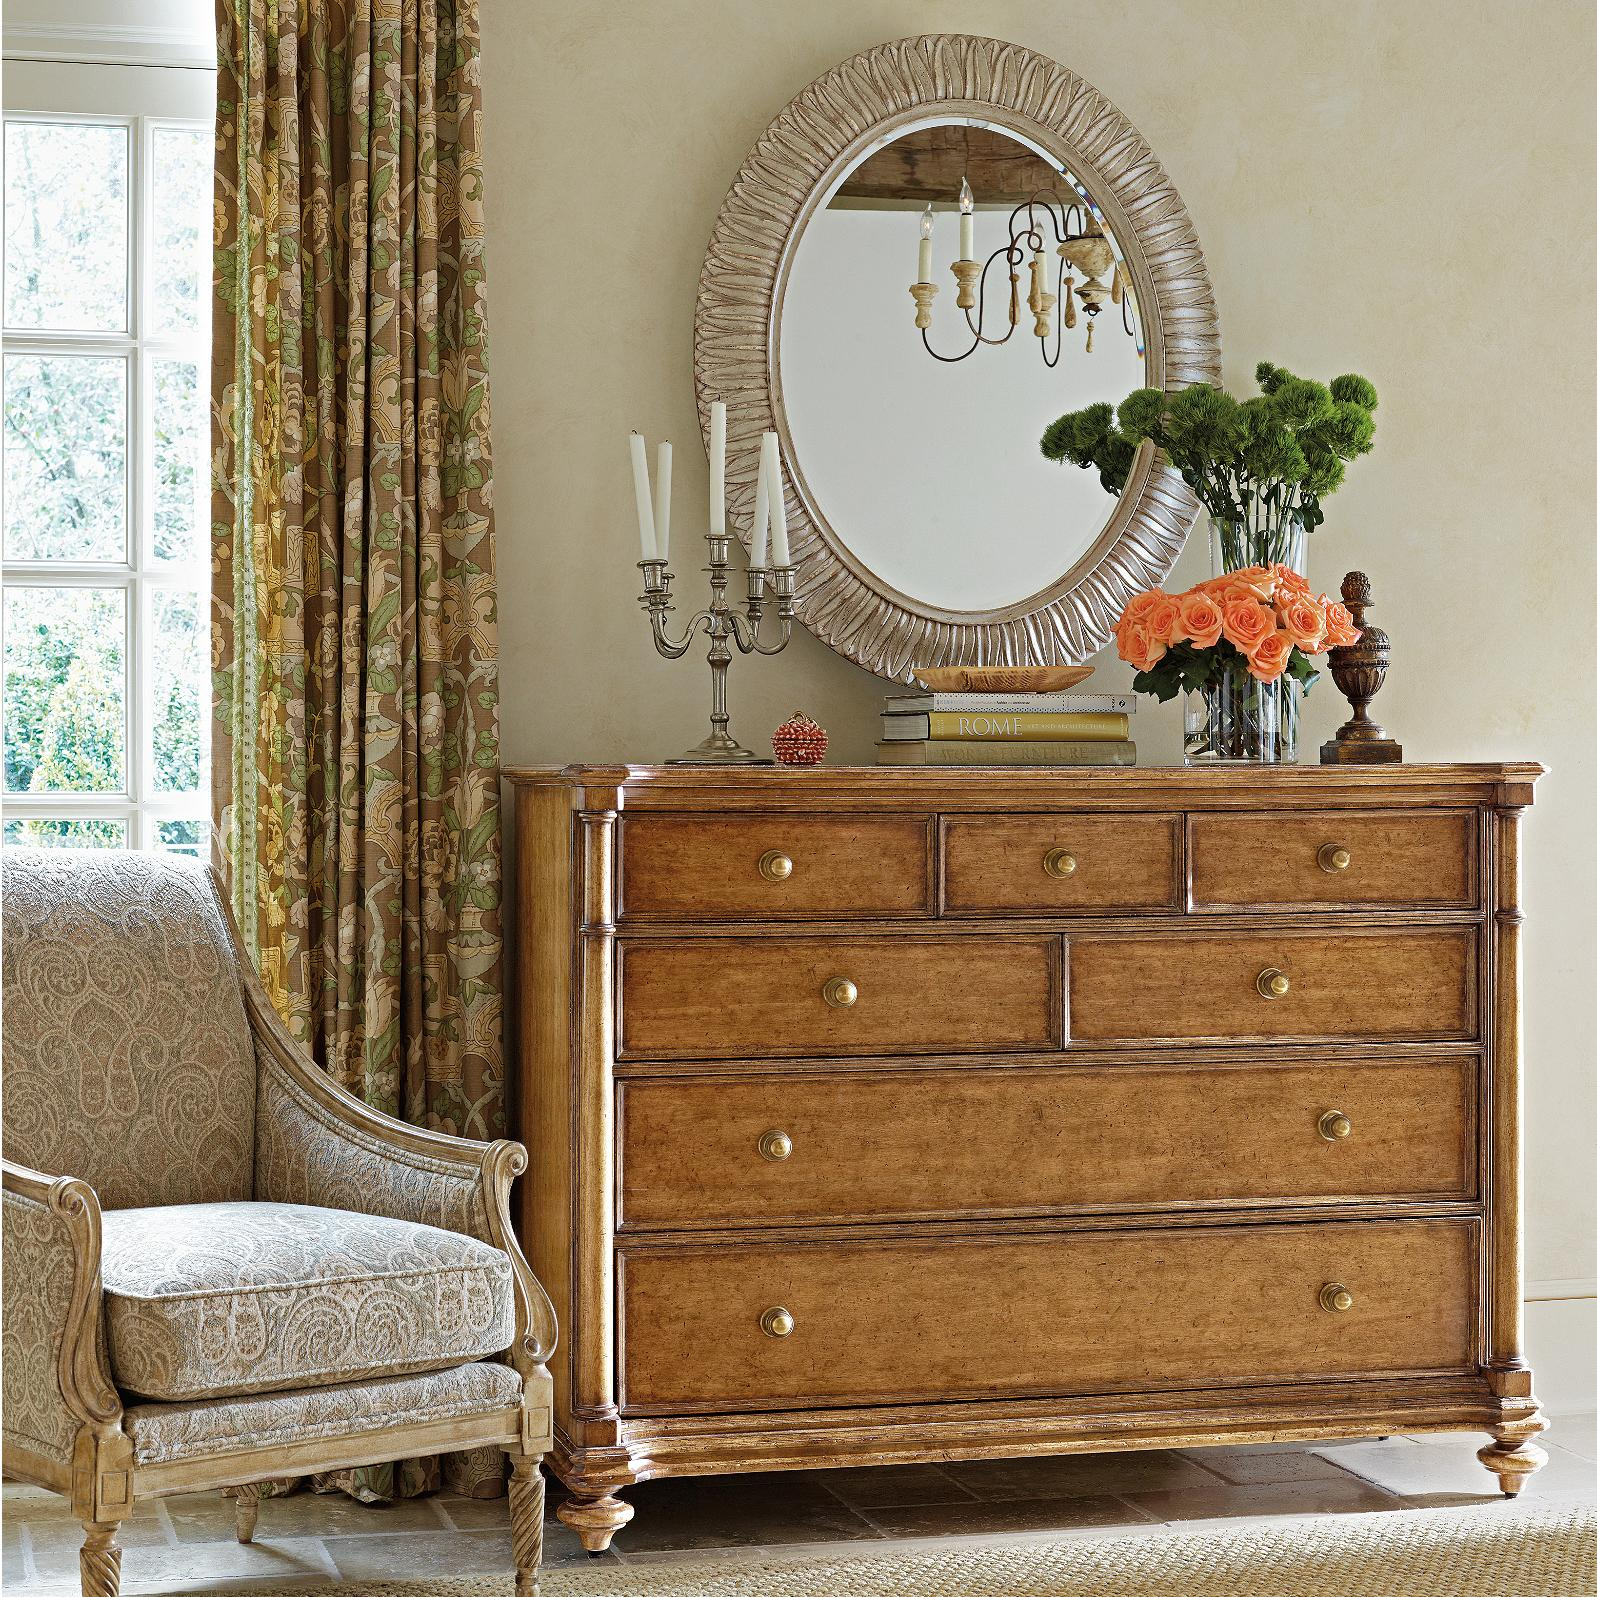 Stanley Furniture Arrondissement Belle Mode Dresser & Jardin Mirror - Item Number: 222-63-05+23-31